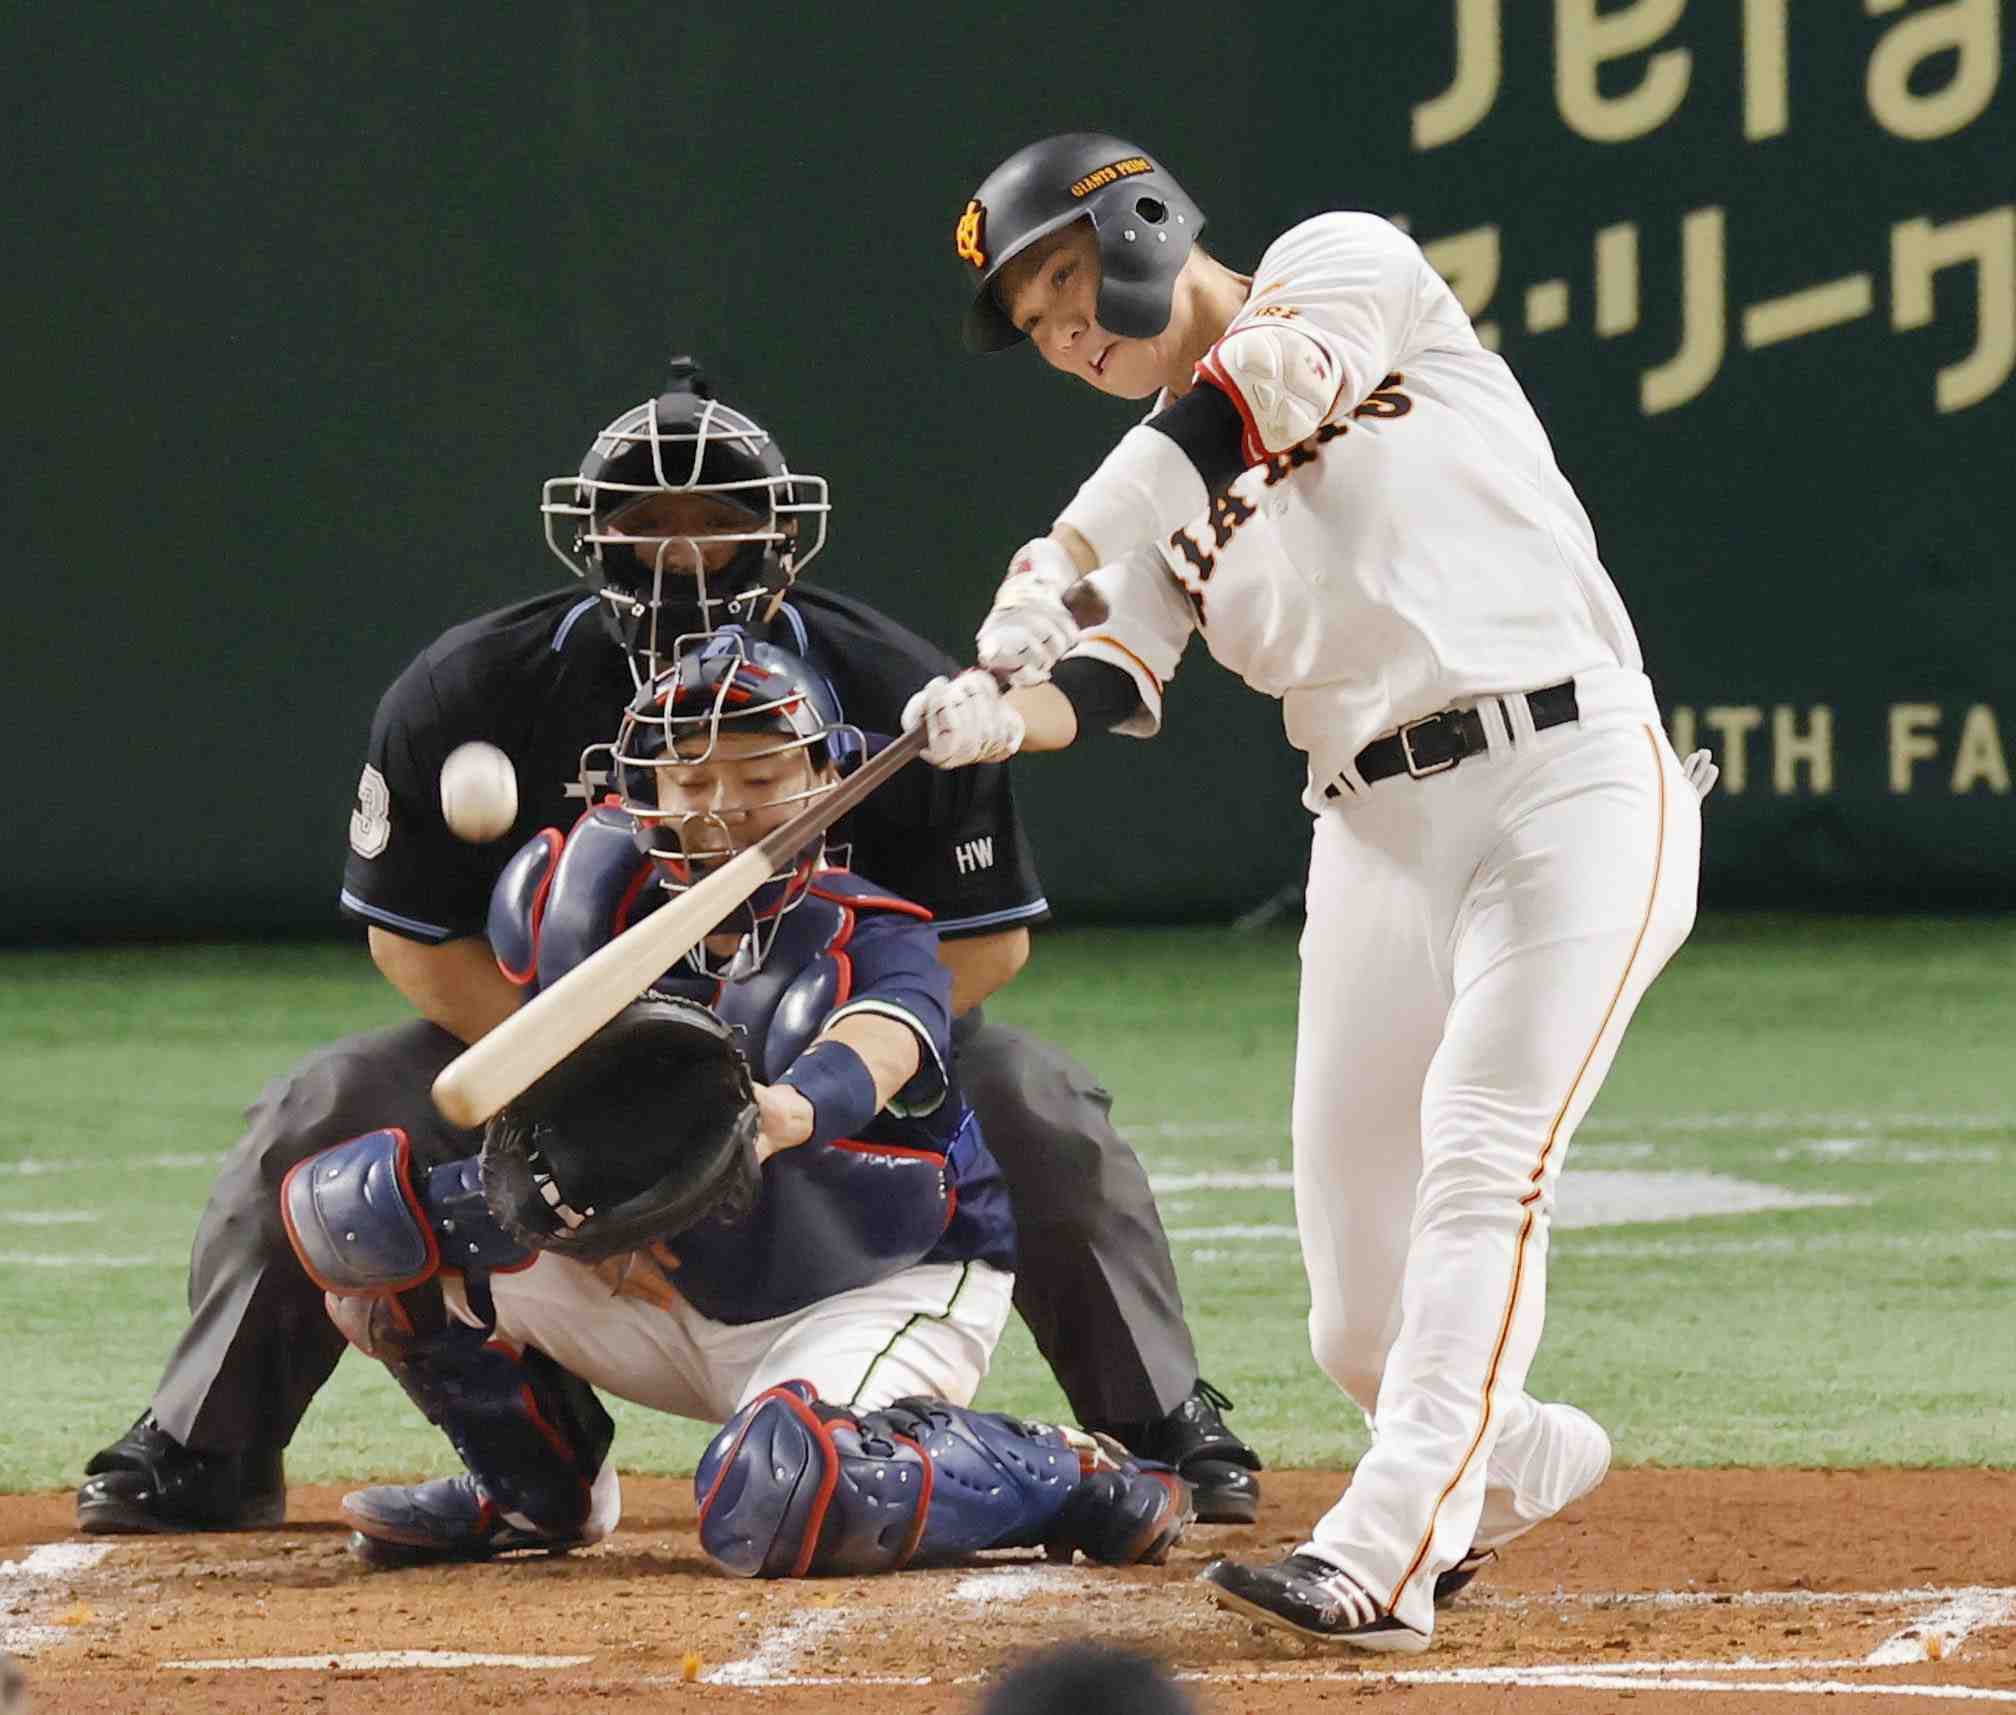 NPB Giants star Hayato Sakamoto gets 2,000th career hit 007